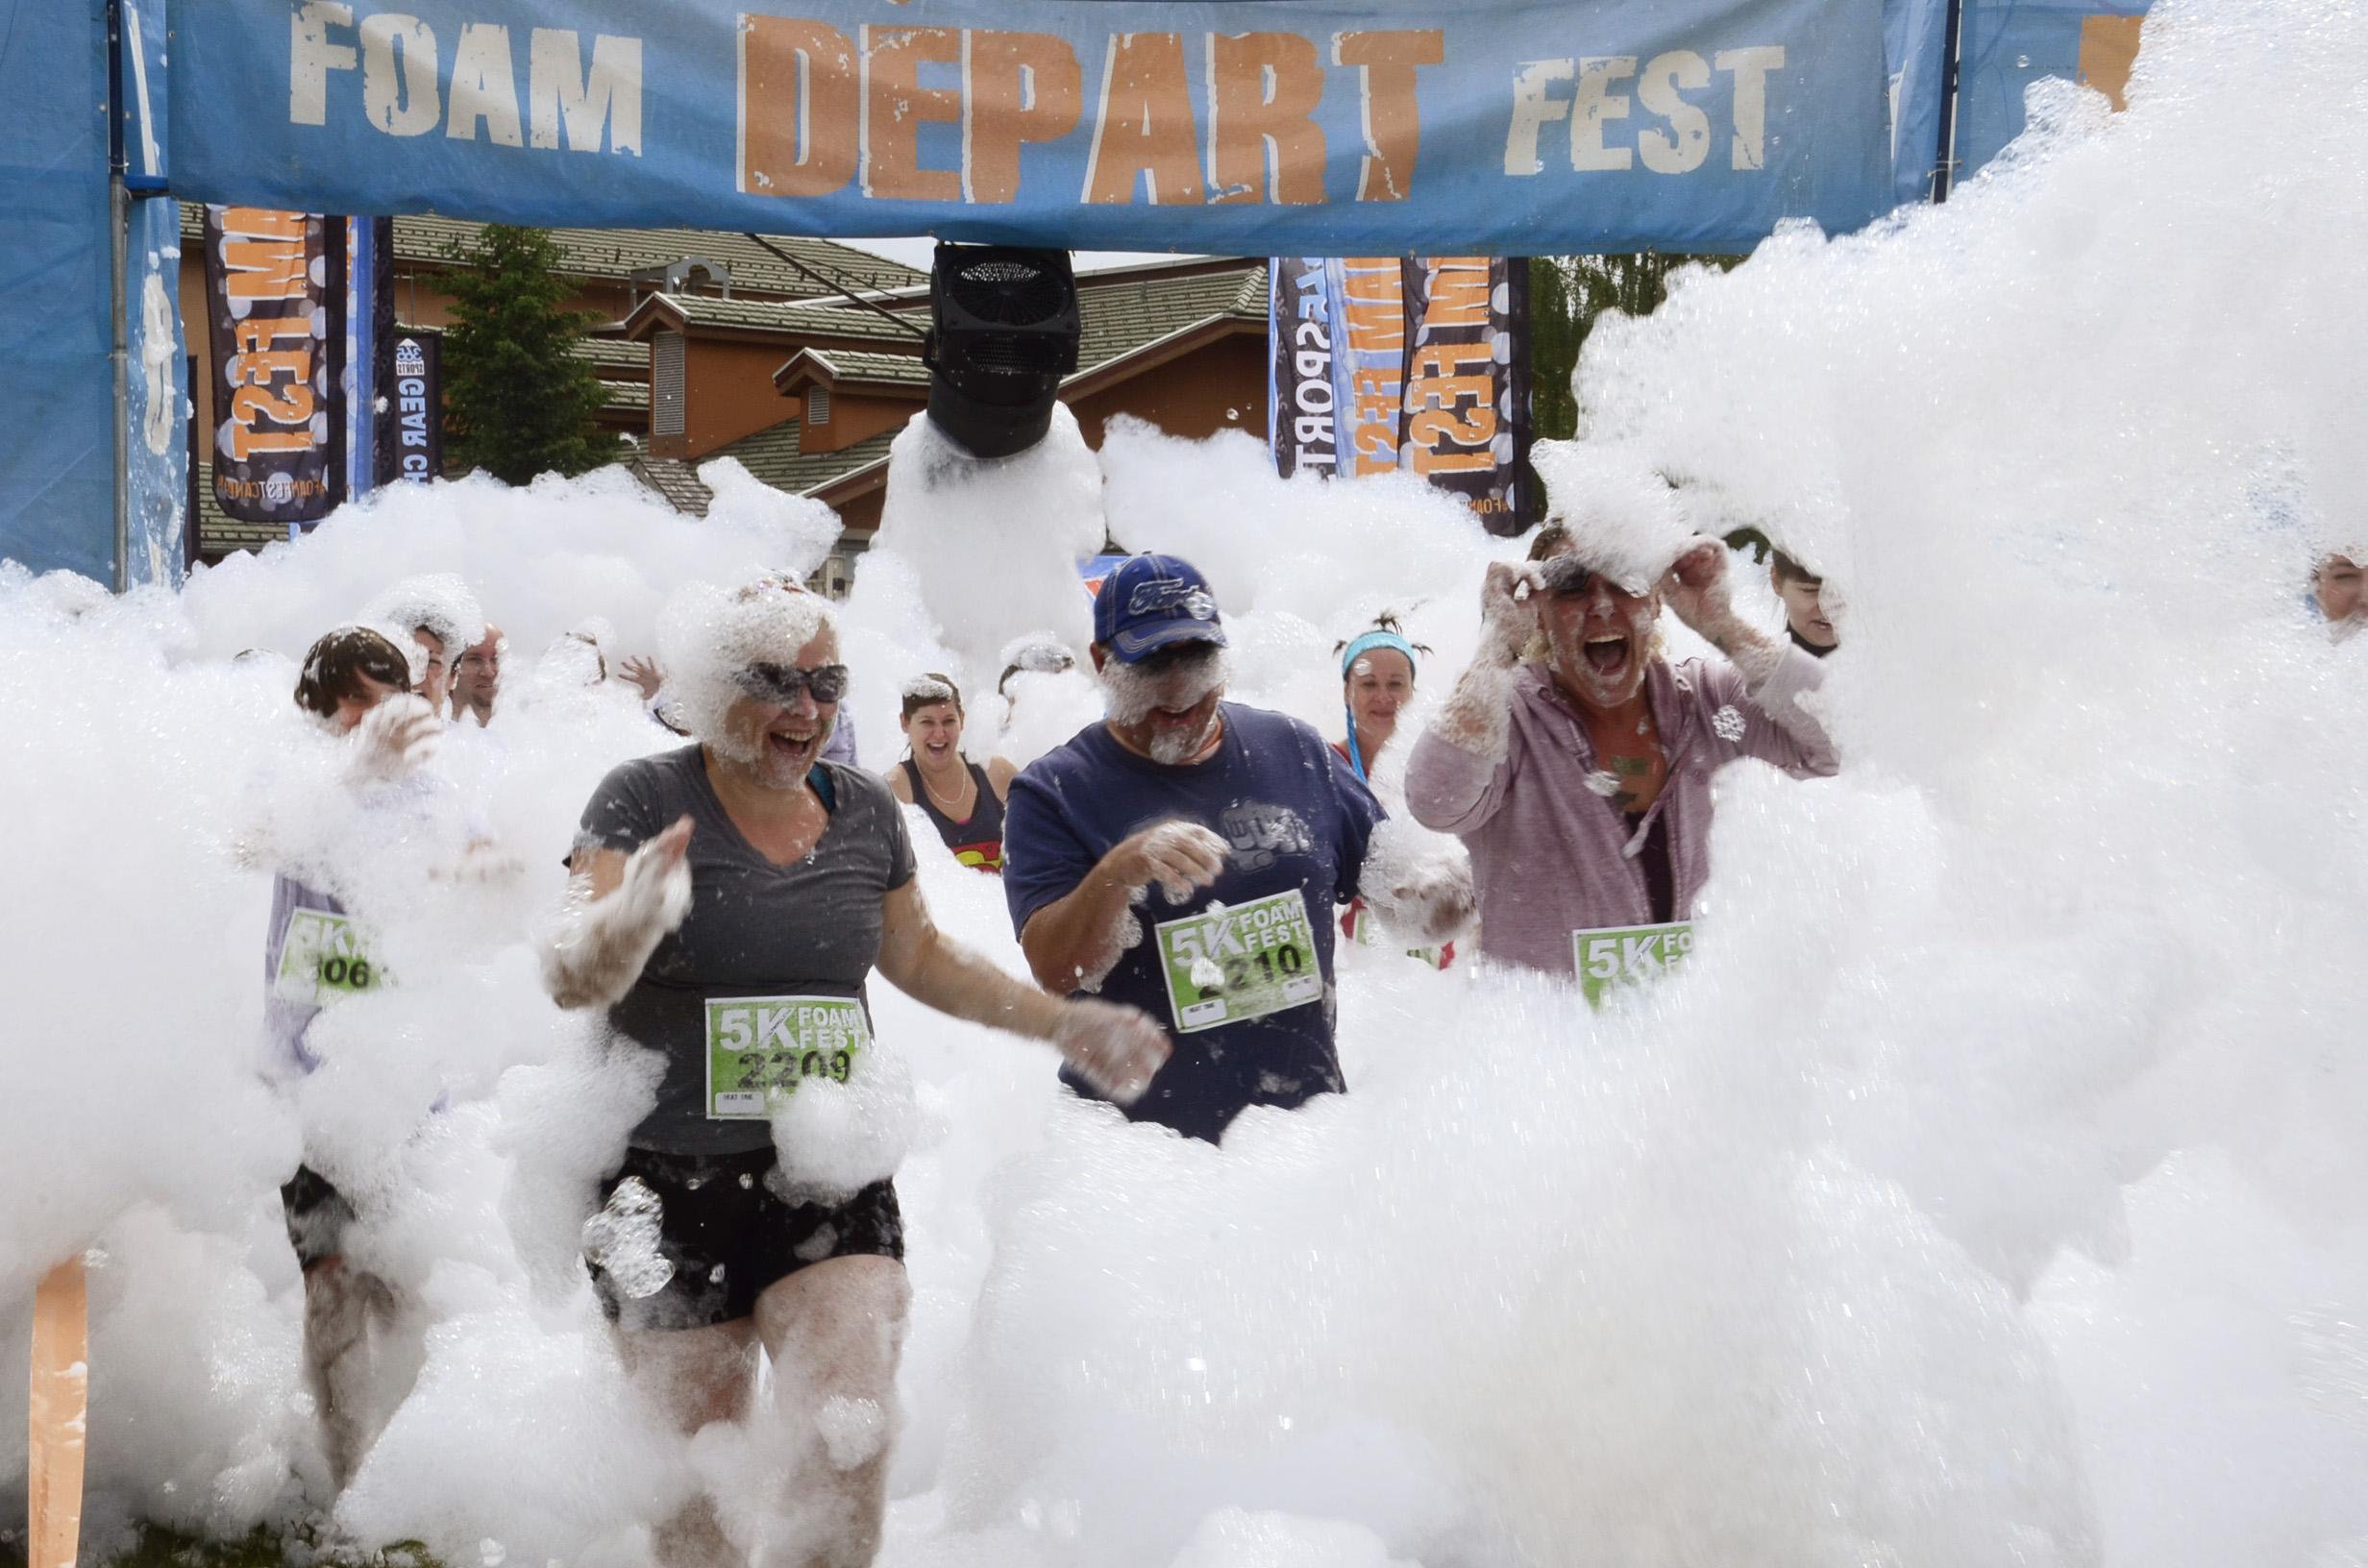 The 4,500 participants in 5K Foam Fest were a part of a very busy spring. - Photo Jamie Shinkewski